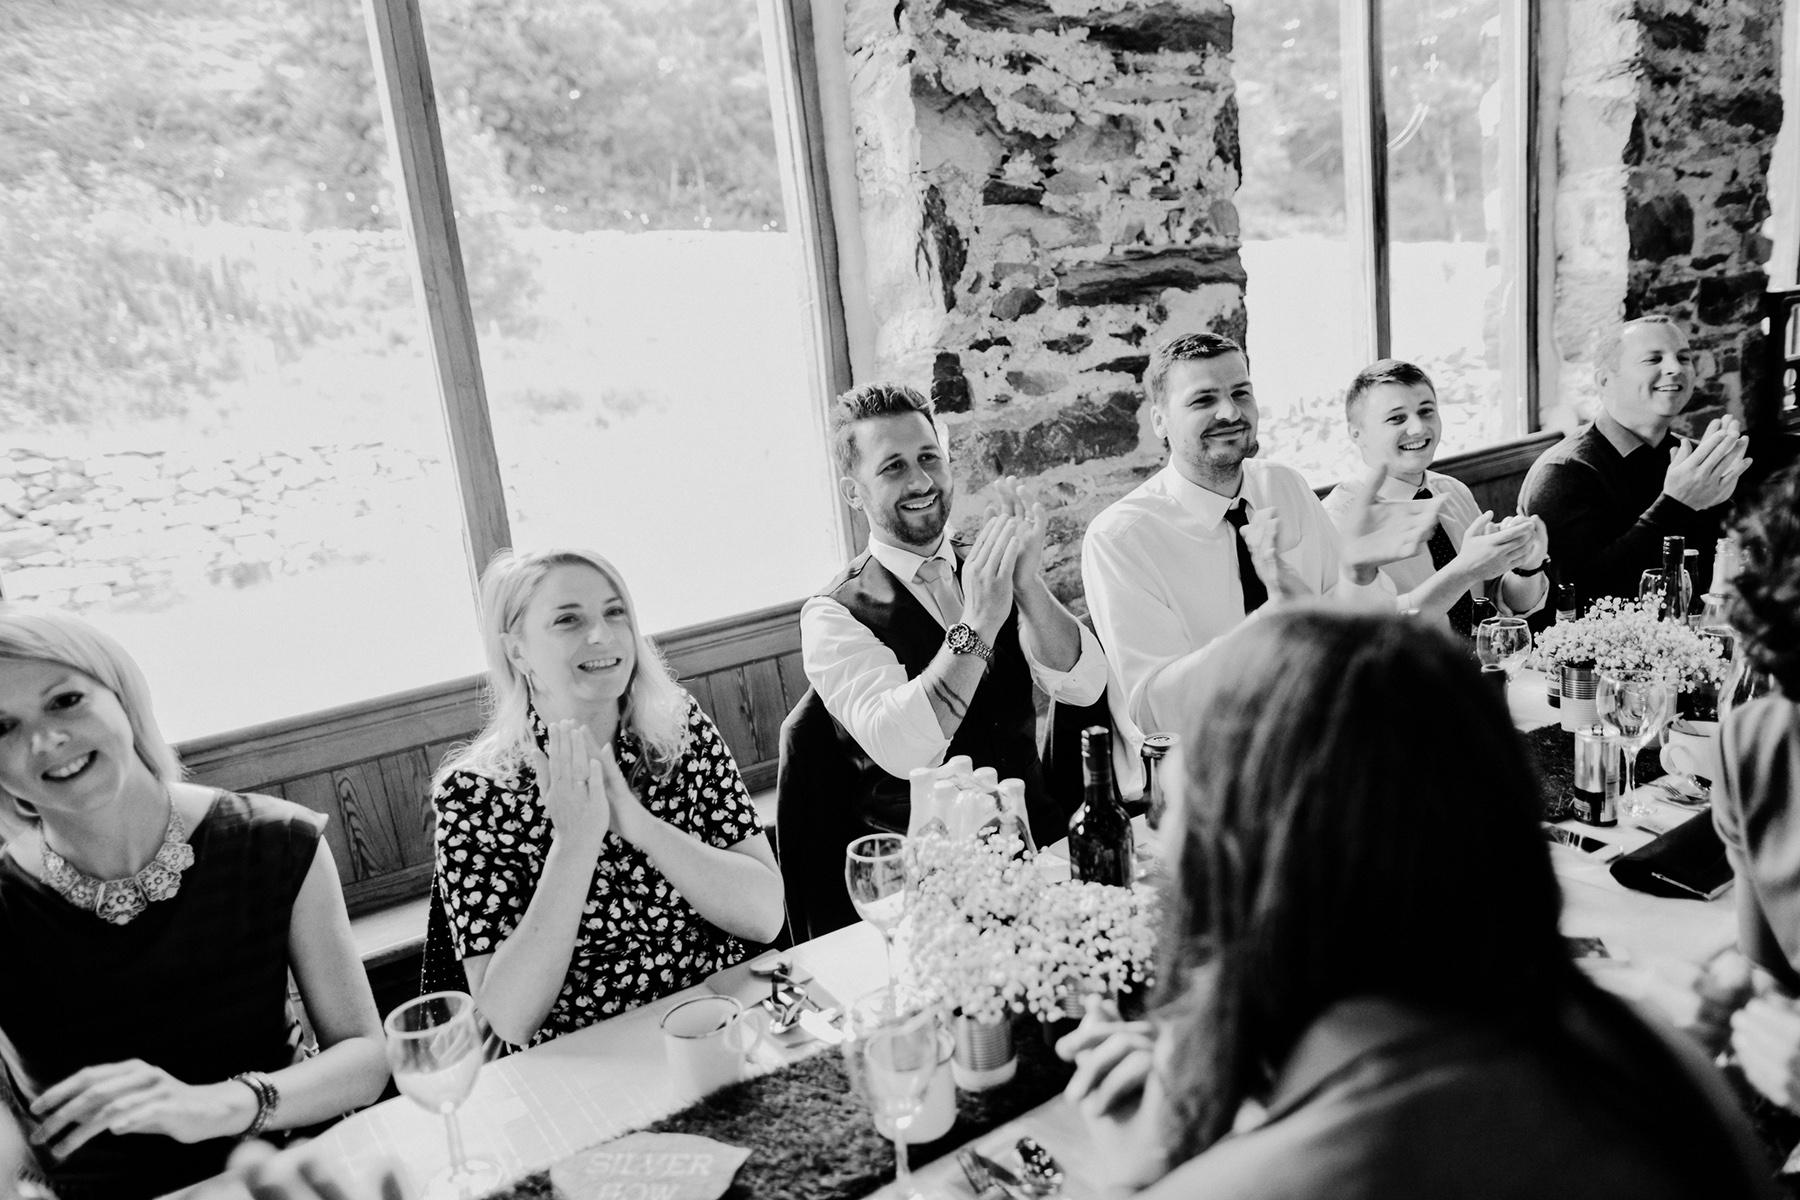 Snowdonia-Wales-Wedding-Photos-0380.jpg